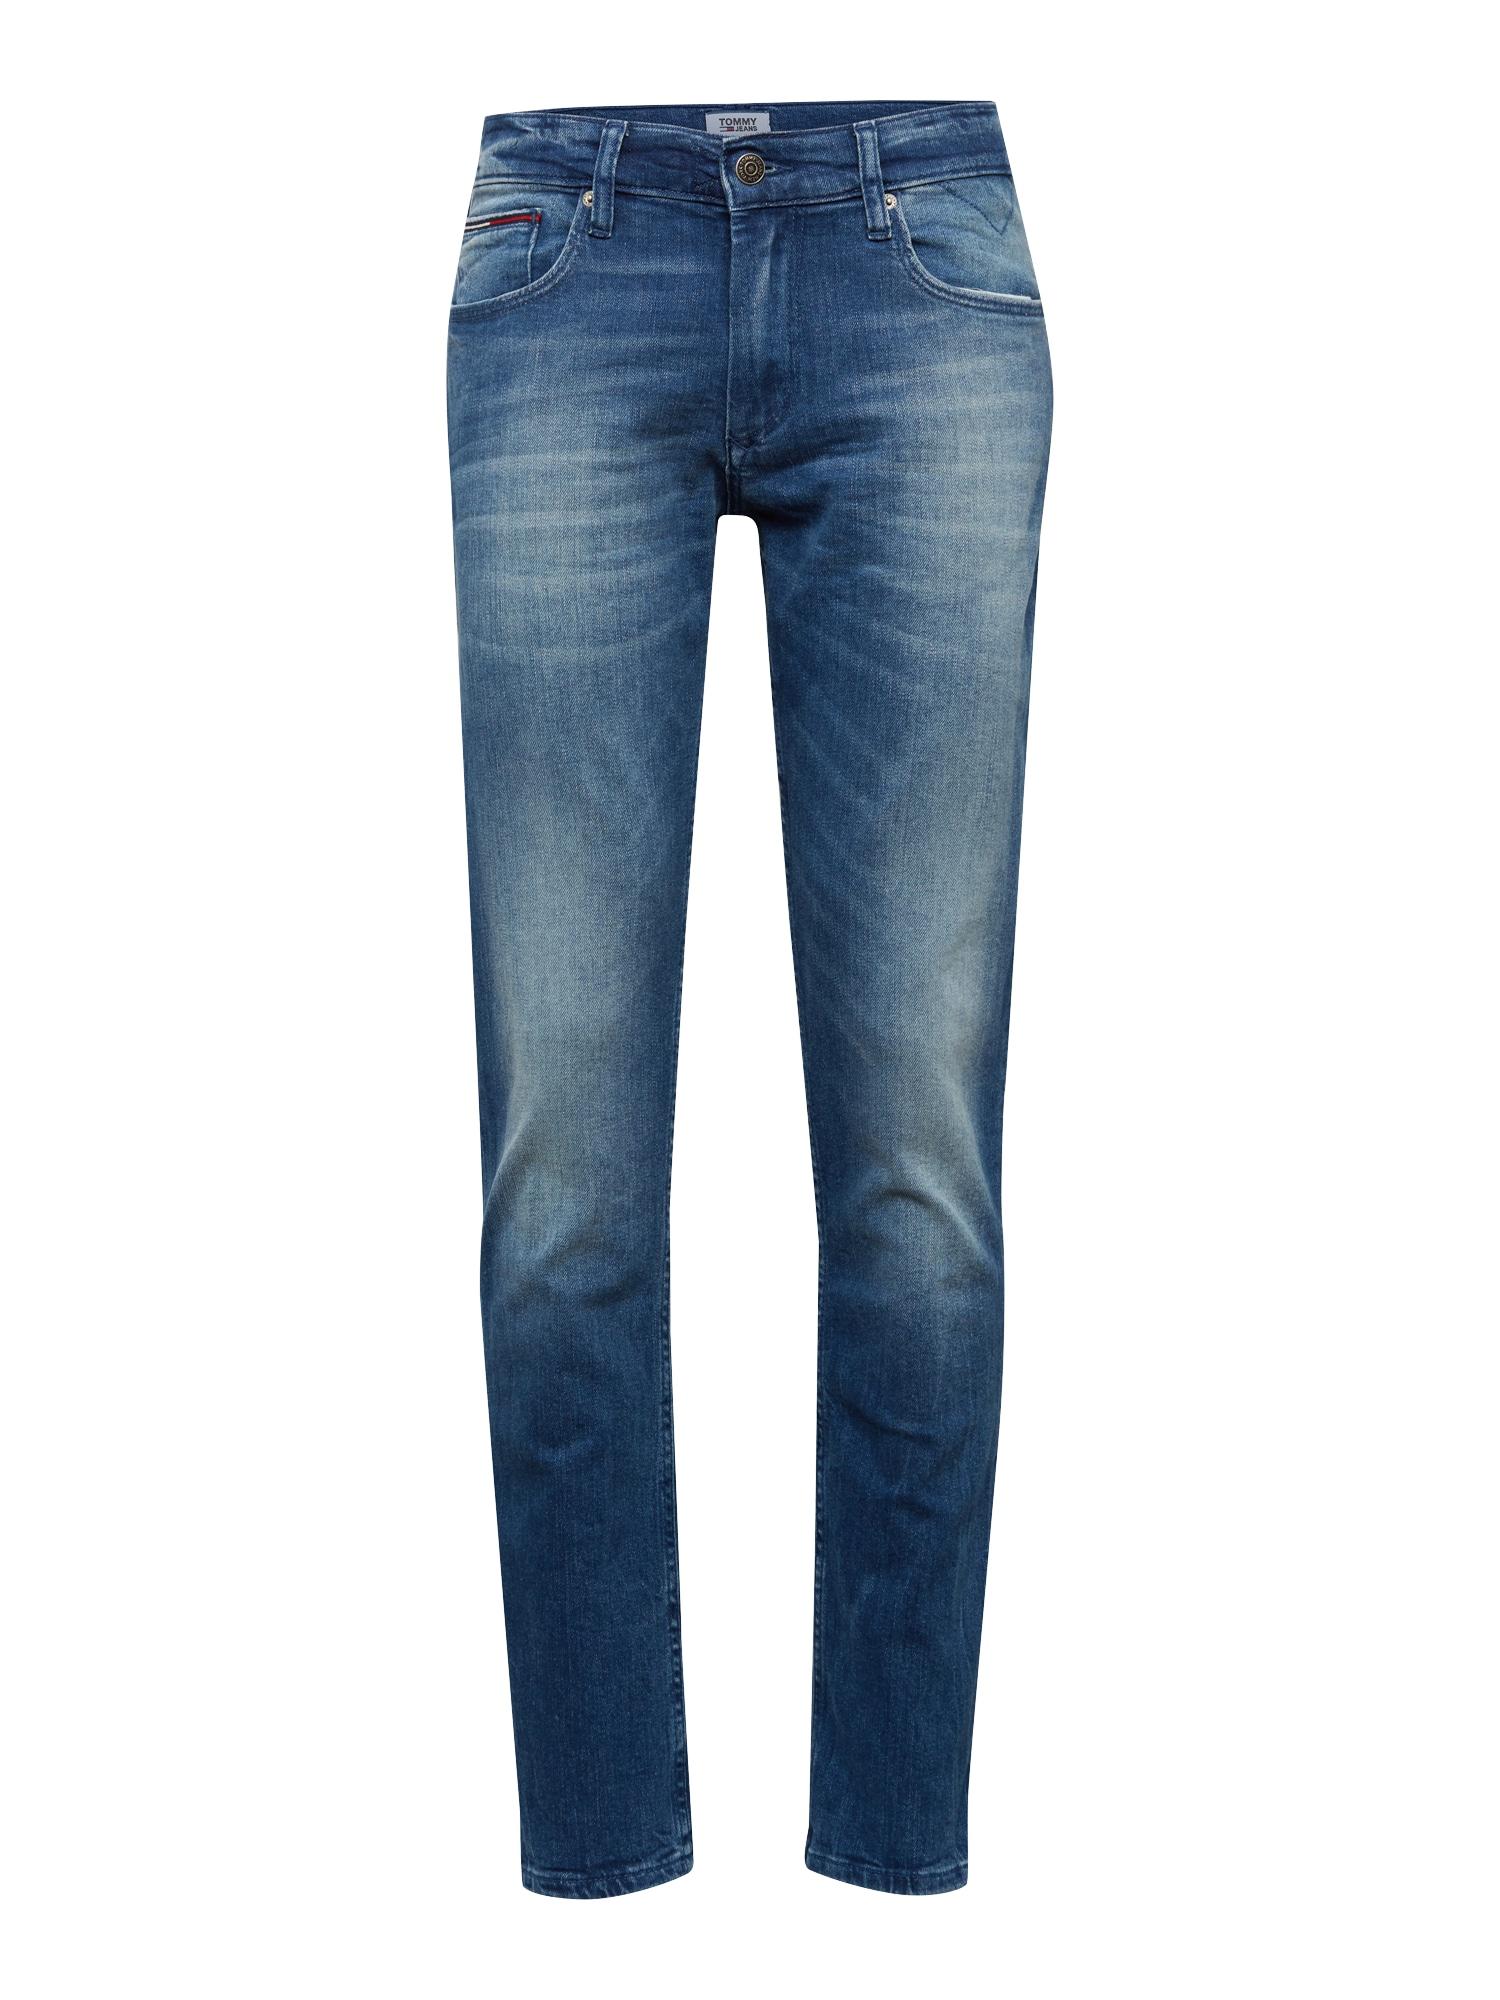 Tommy Jeans Džinsai 'Original Straight Ryan BEMB' tamsiai (džinso) mėlyna